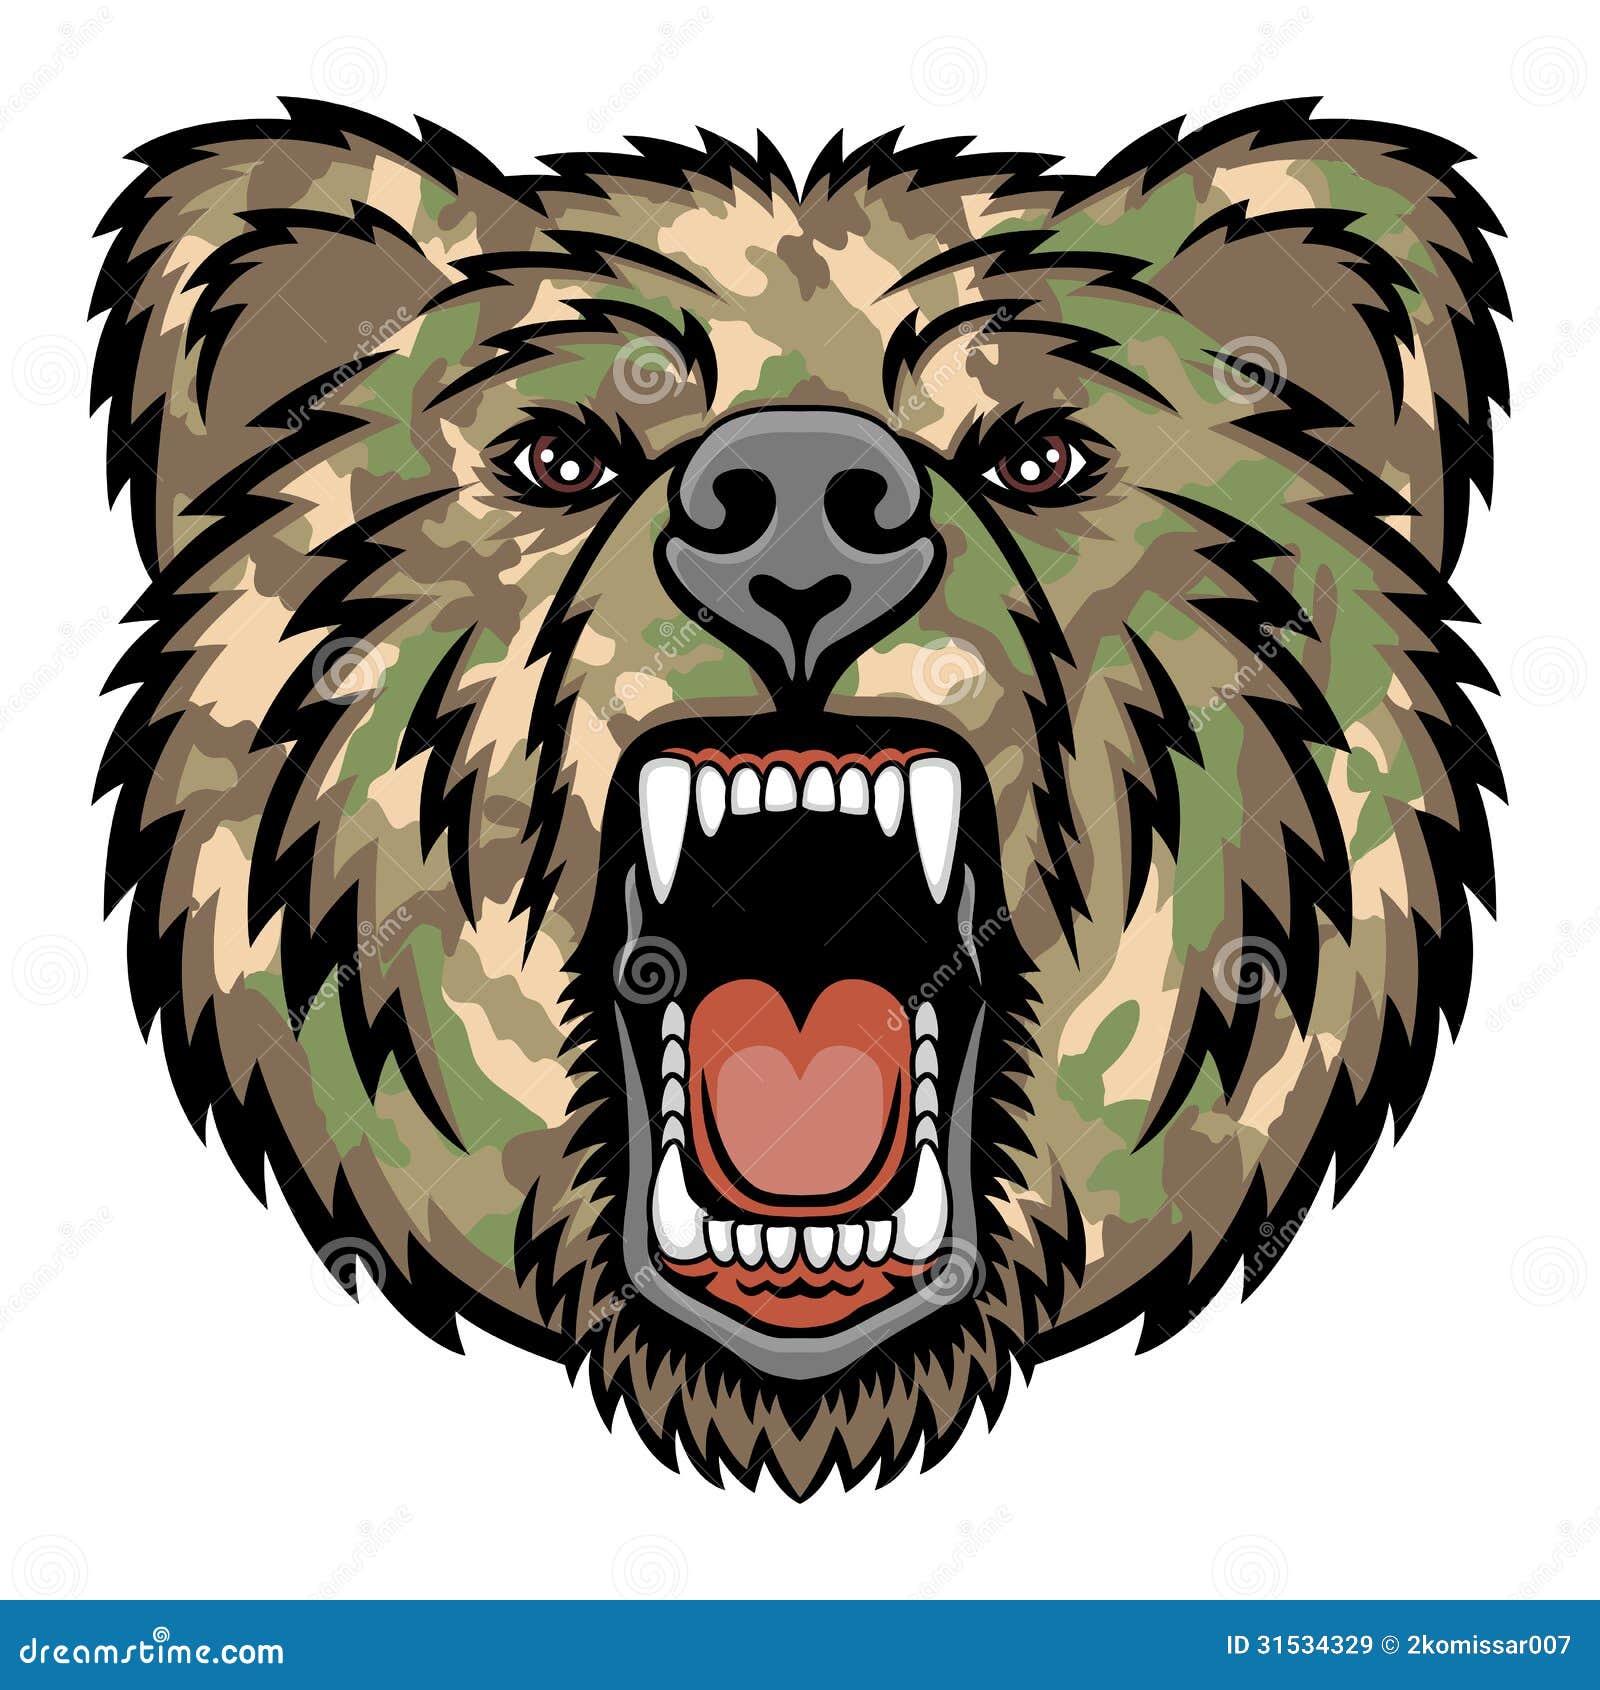 growling bear stock illustration illustration of